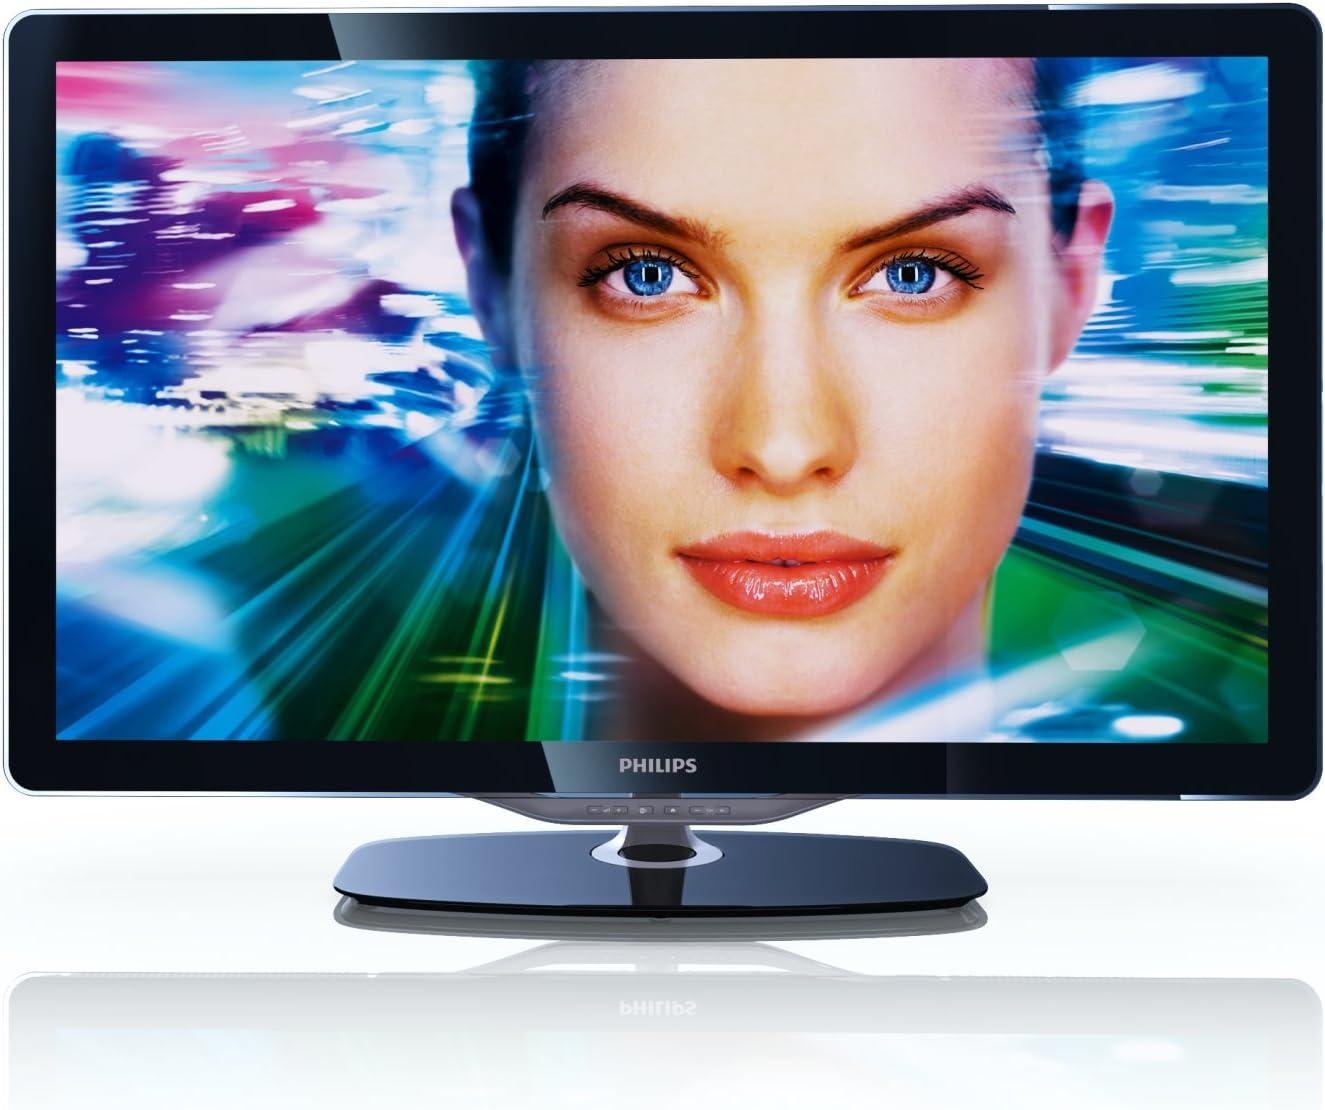 Philips 40PFL8605H - Televisor LED Full HD 40 pulgadas (3D): Amazon.es: Electrónica